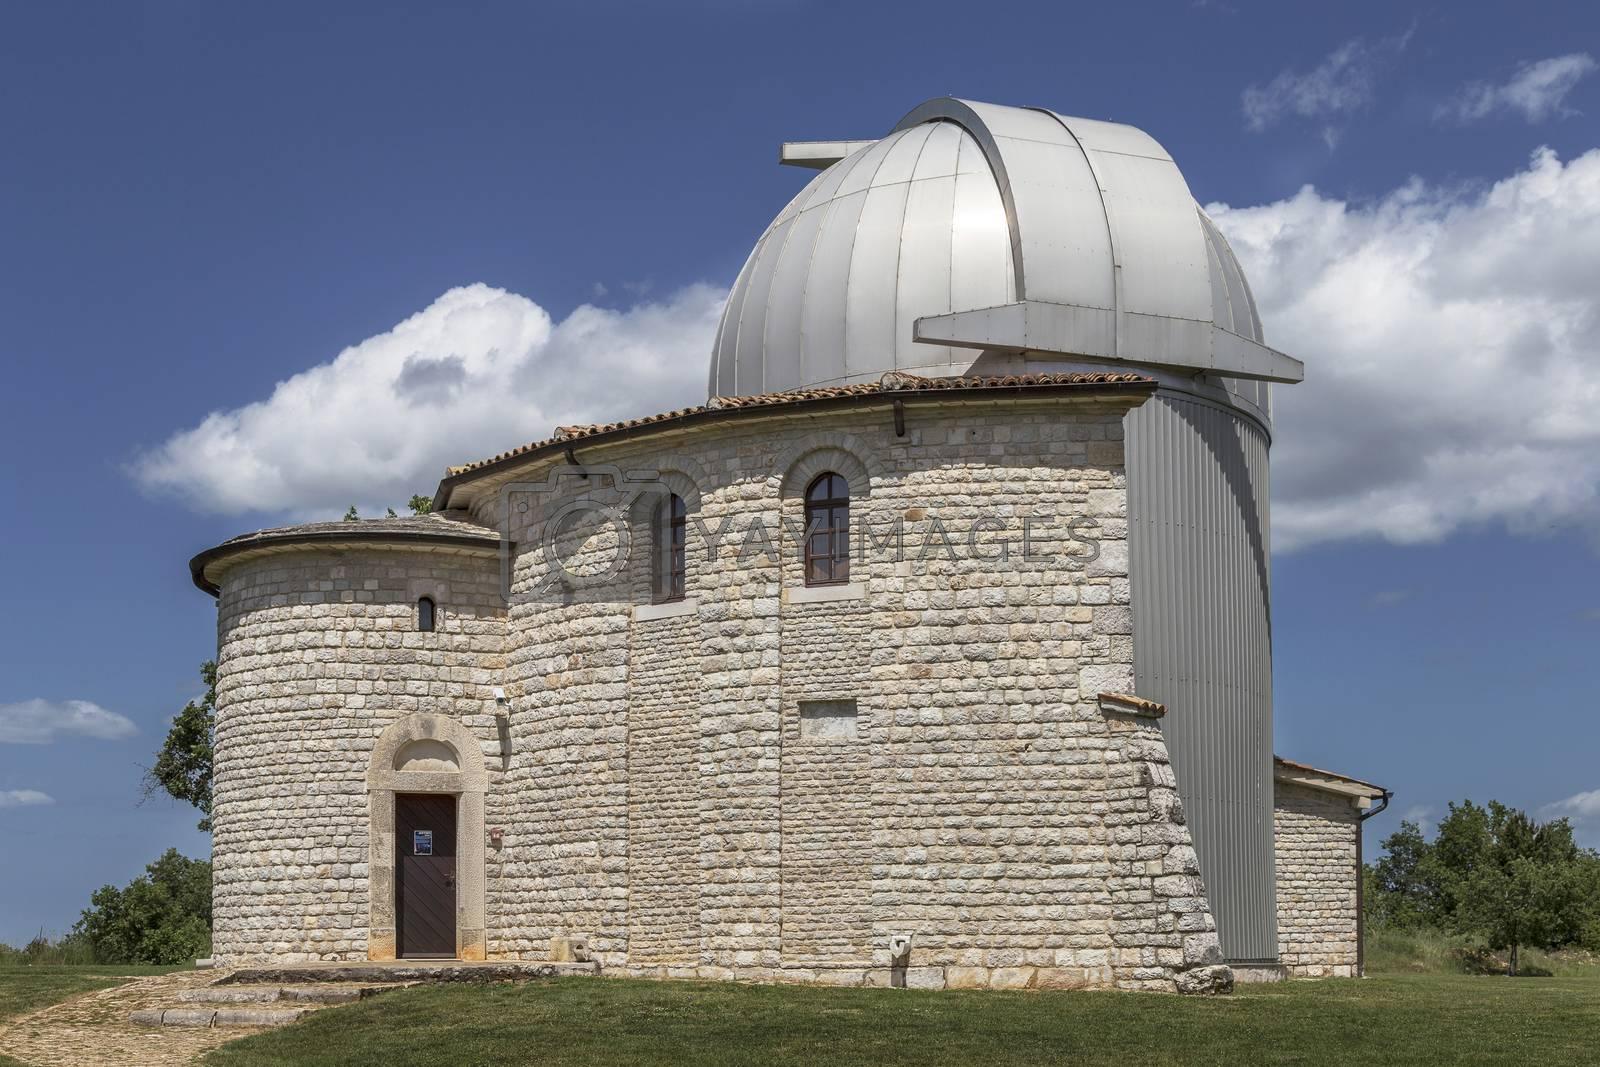 side view of the famous observatory, Tican - Visnjan, Istria, Croatia